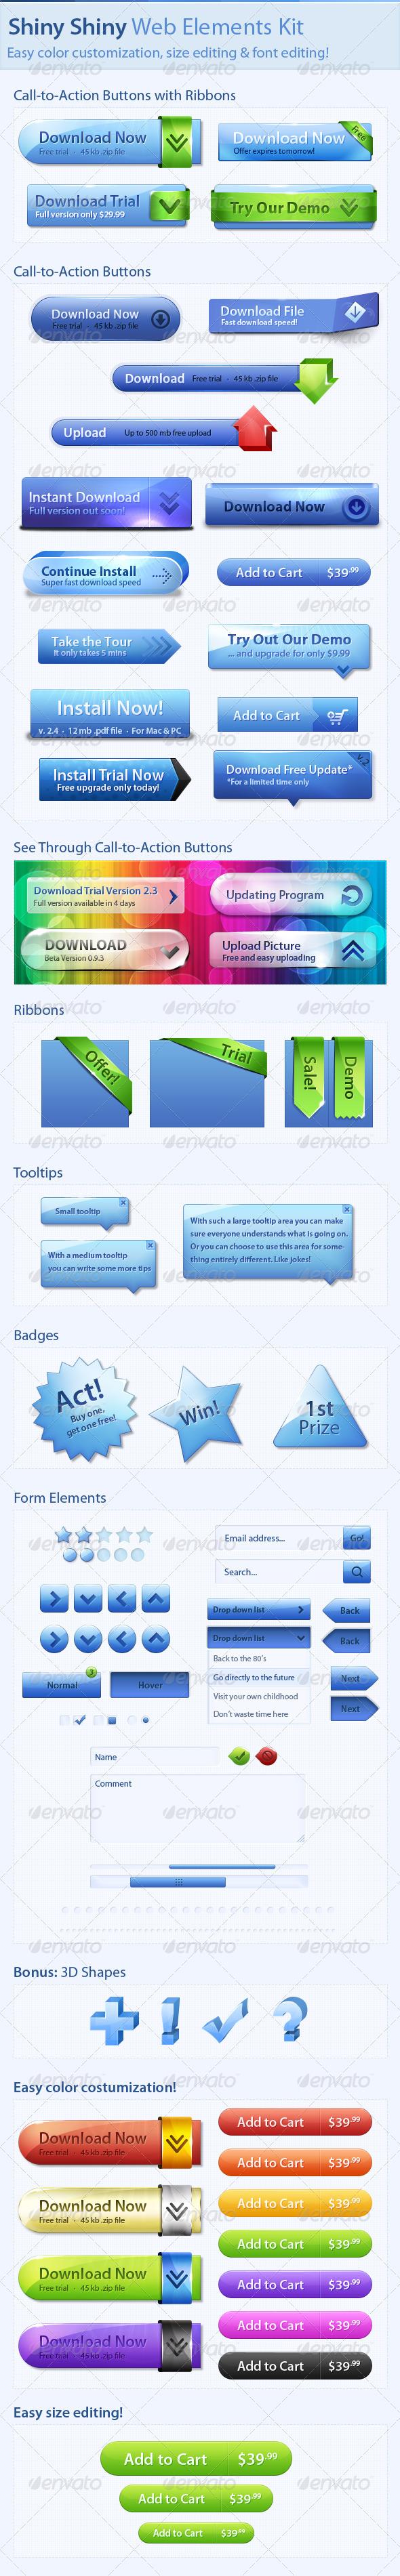 GraphicRiver Shiny Shiny Web Elements Kit 1687008